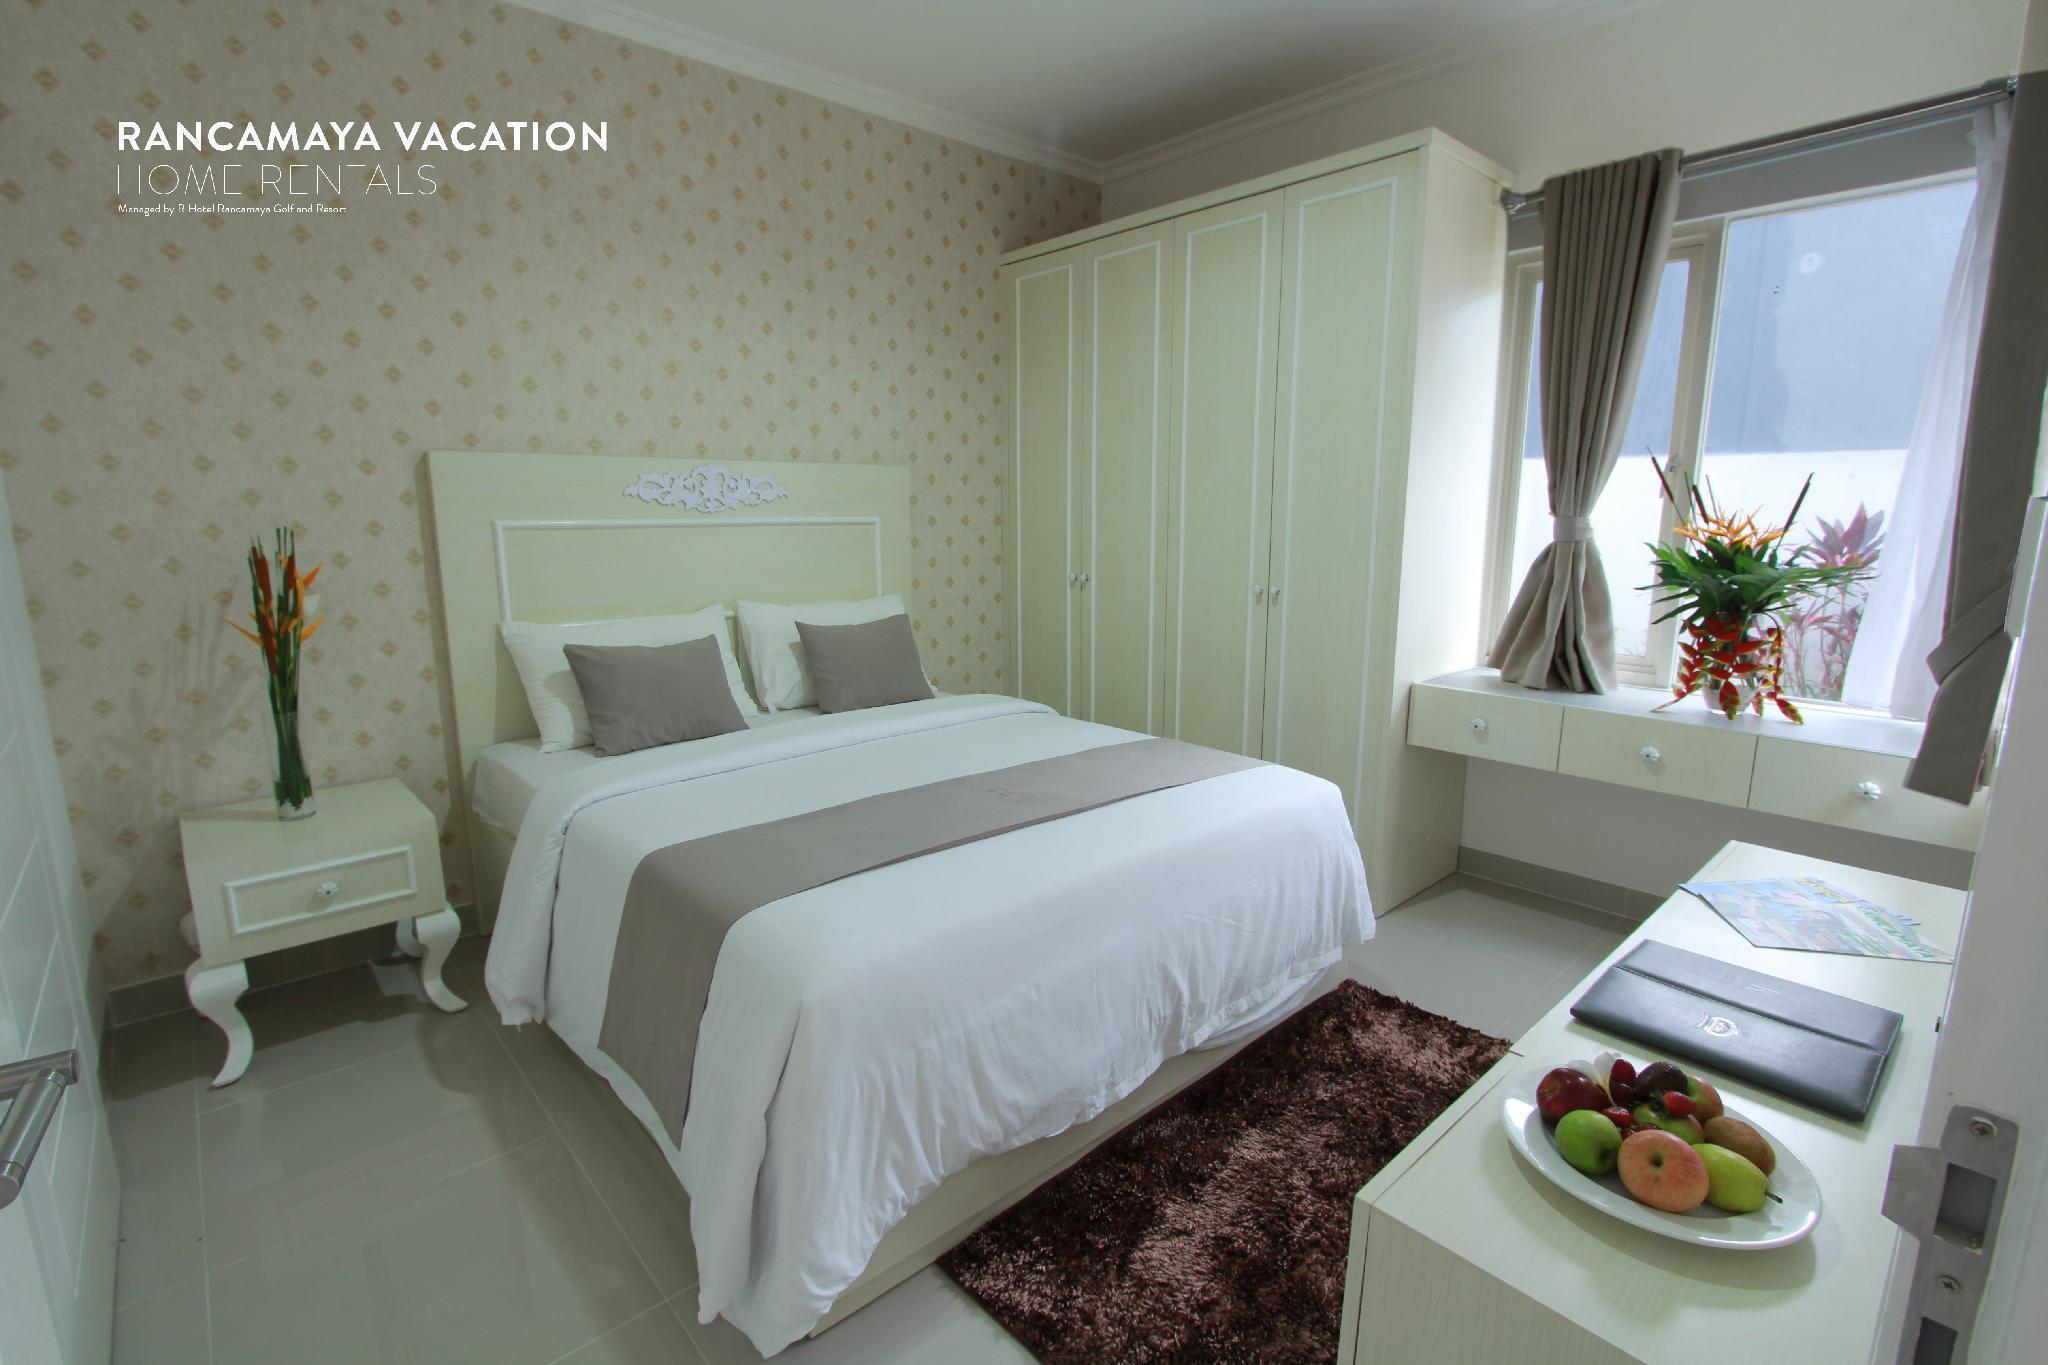 R Hotel Rancamaya Resort Bogor Deals Photos Reviews